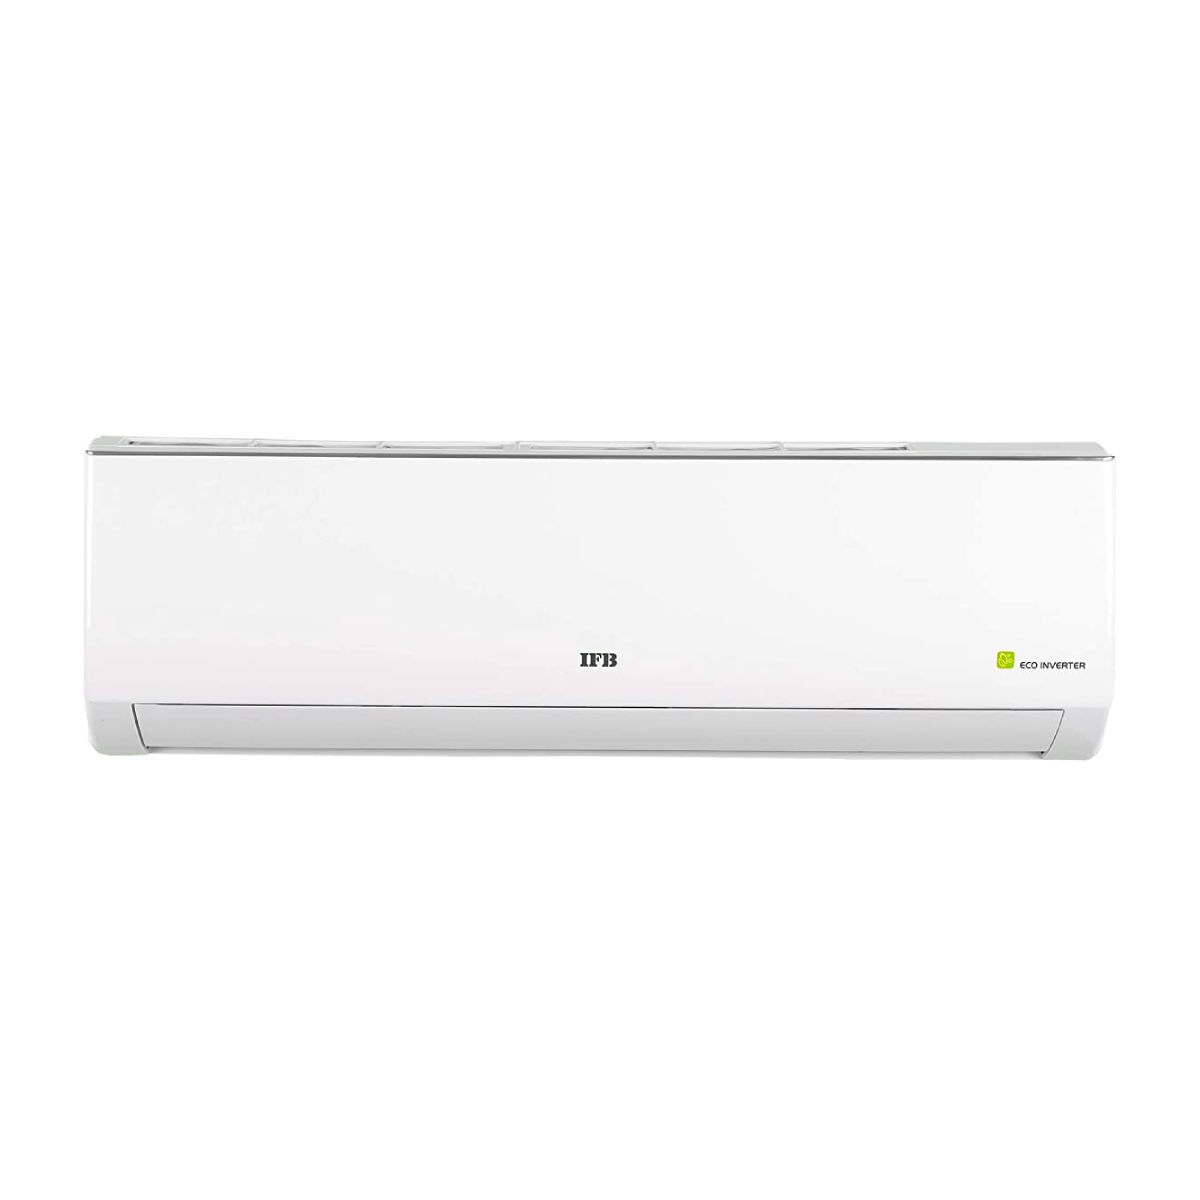 आईएफबी IACI18X83T3C 1.5 Ton 3 Star Inverter Split Air Conditioner